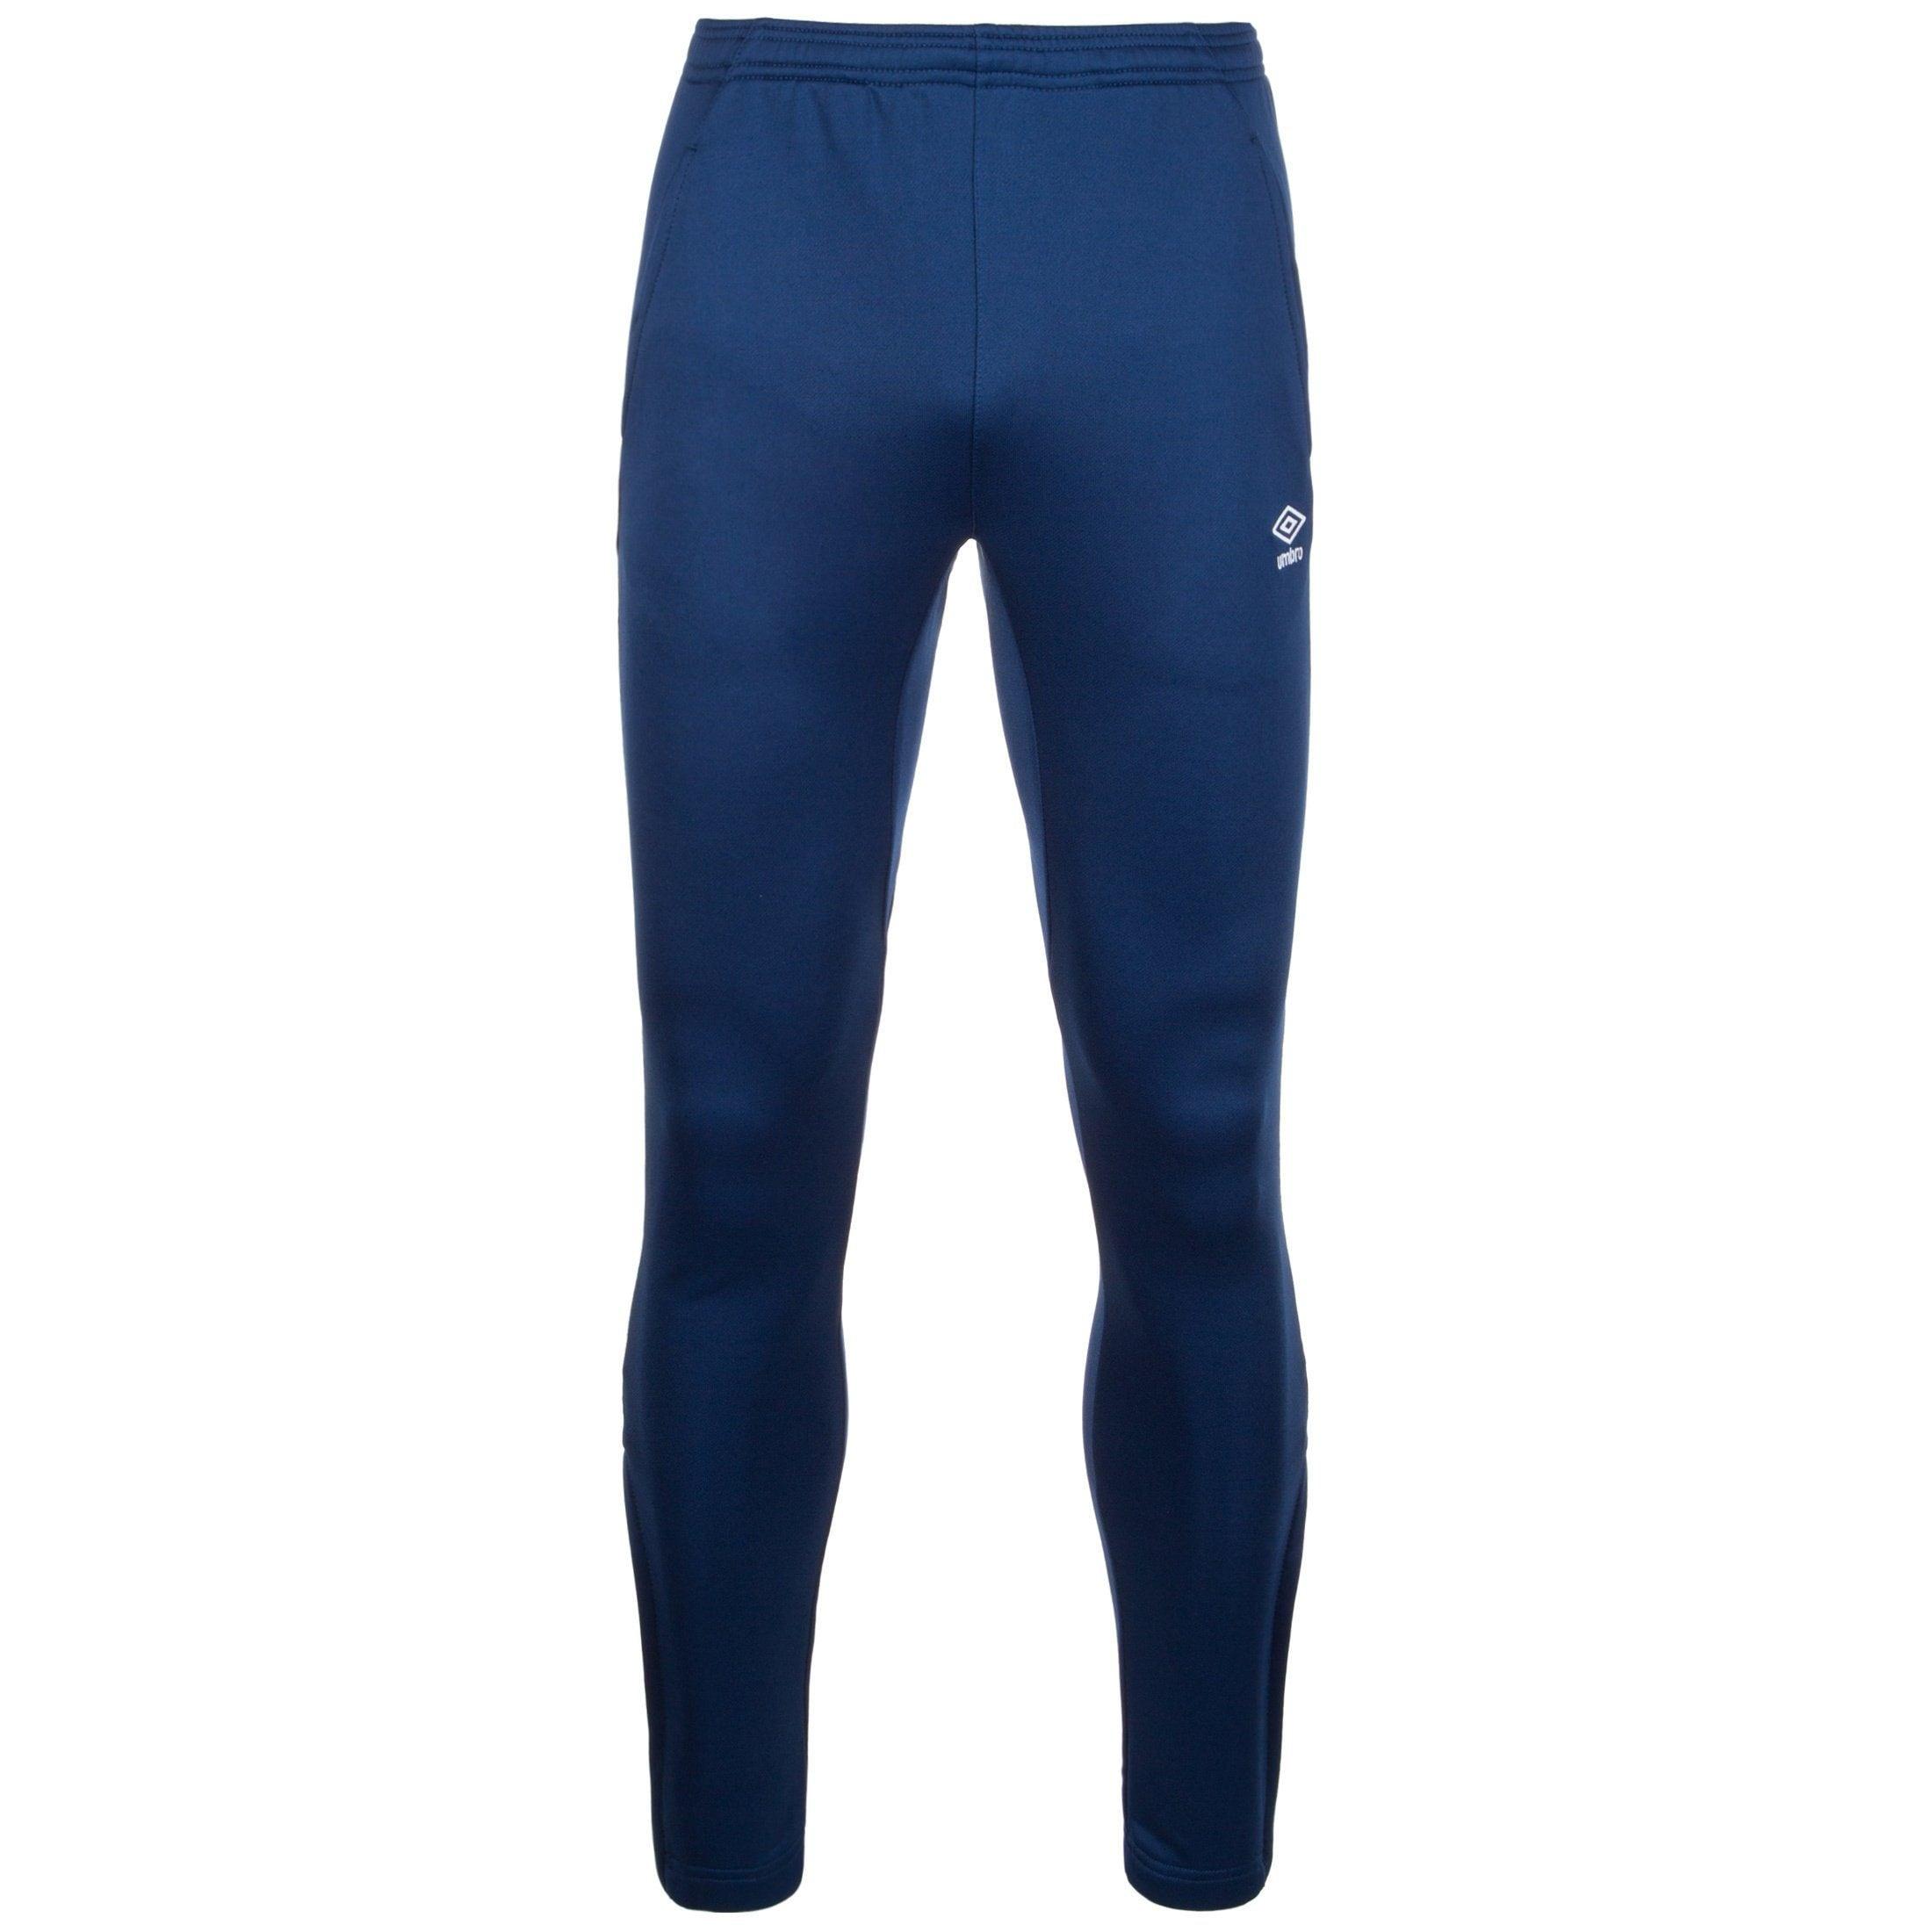 Umbro Trainingshose Tapered | Sportbekleidung > Sporthosen > Trainingshosen | Blau | Umbro